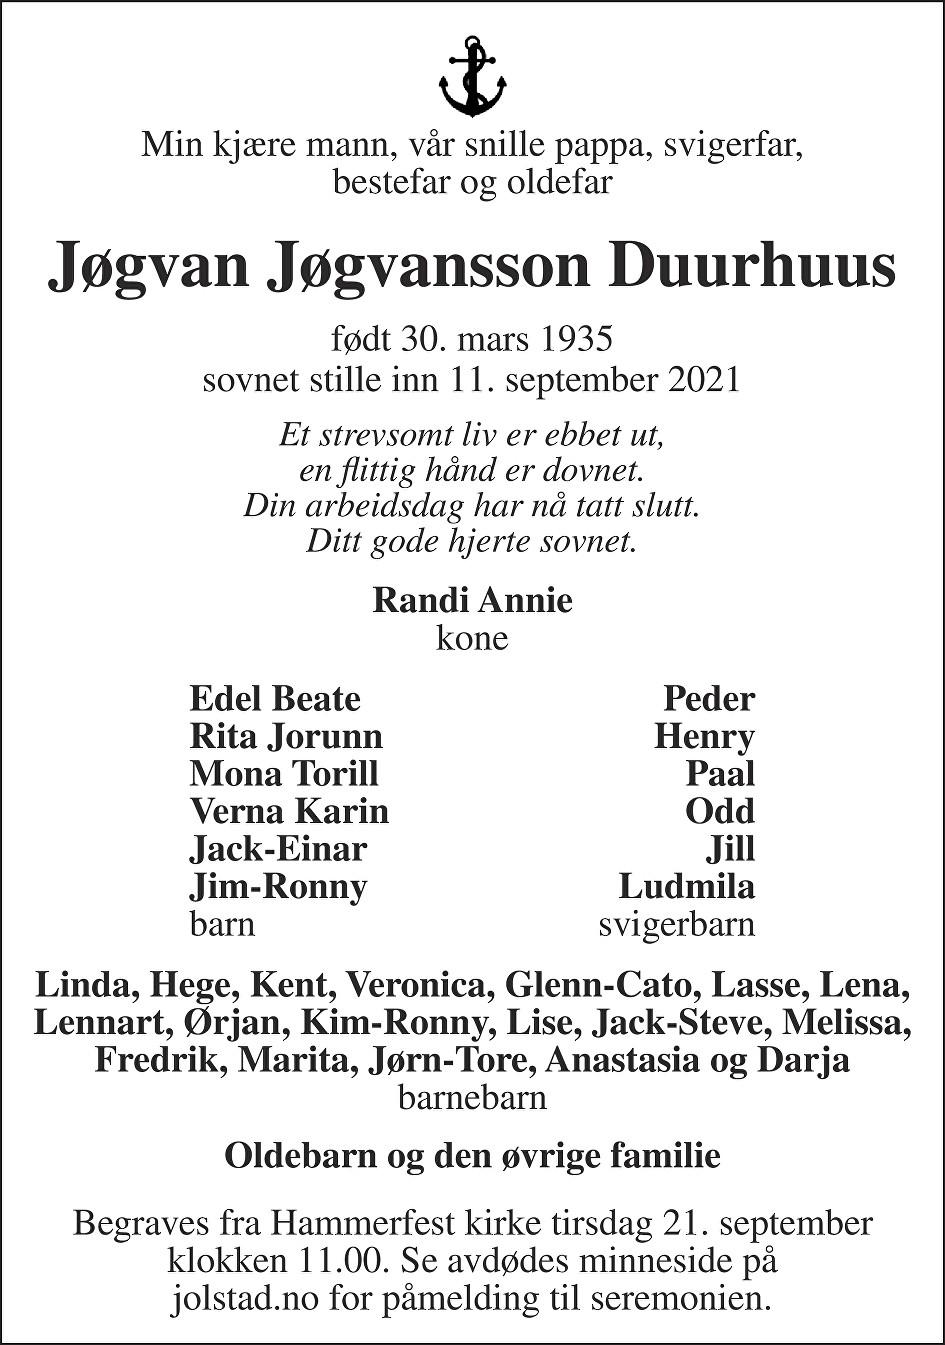 Jøgvan Jøgvansson Duurhuus Dødsannonse